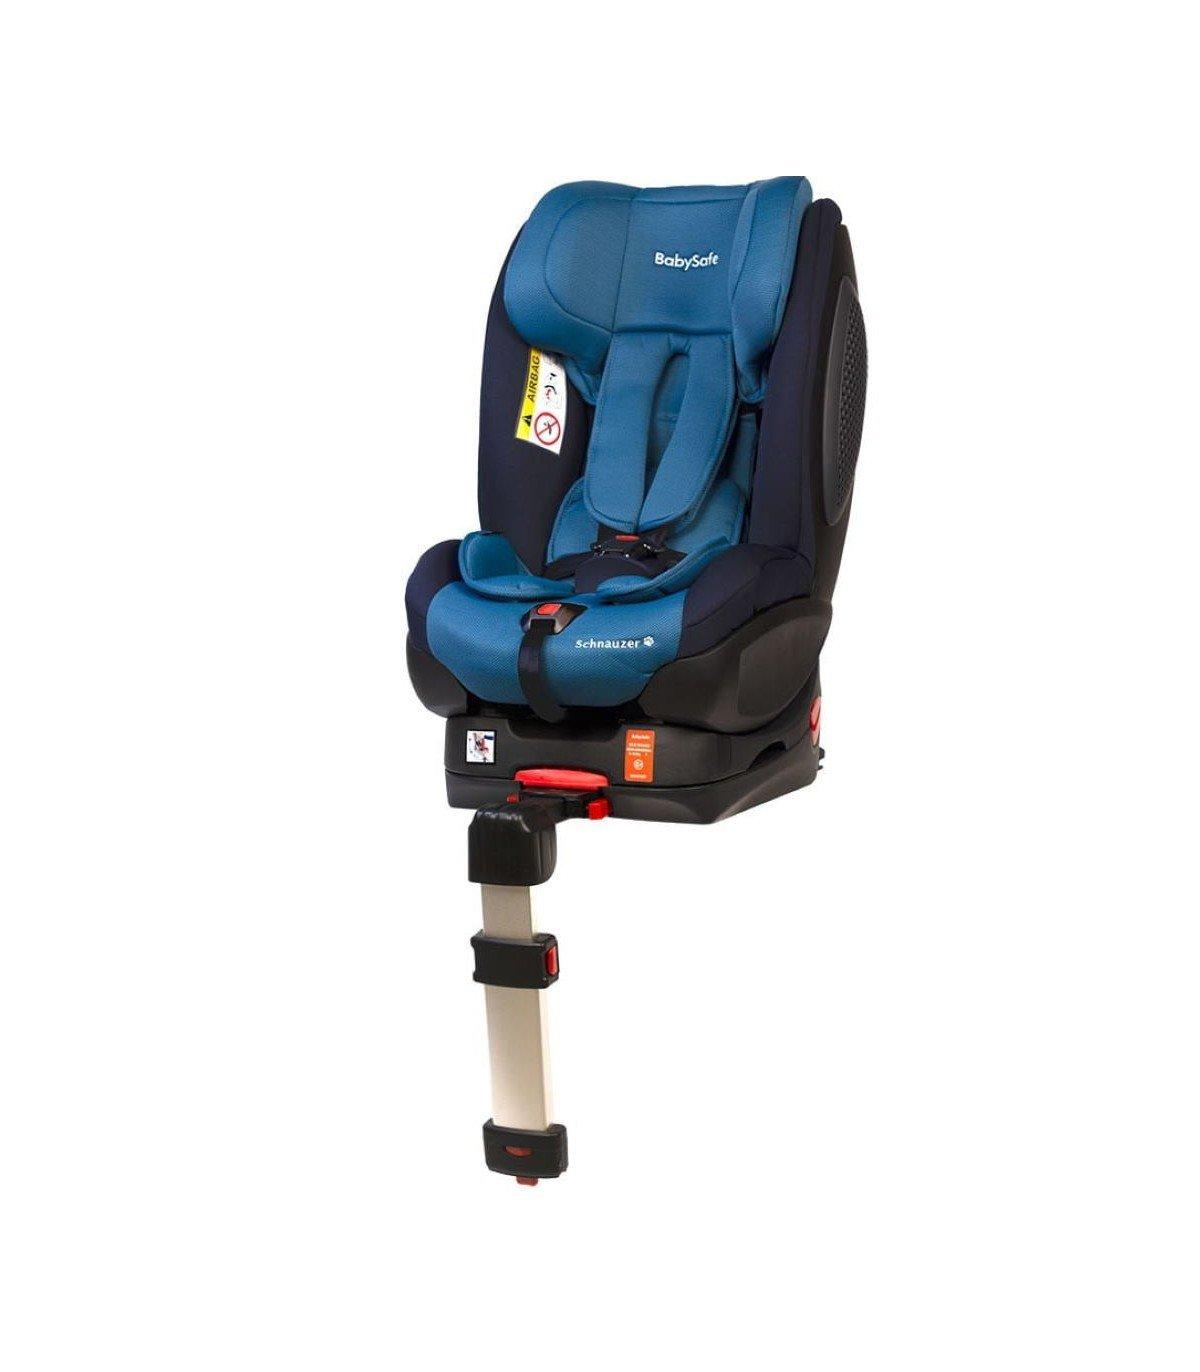 BabySafe Schnauzer Blue + Base ISOFIX Bērnu autosēdeklis 0-18 kg